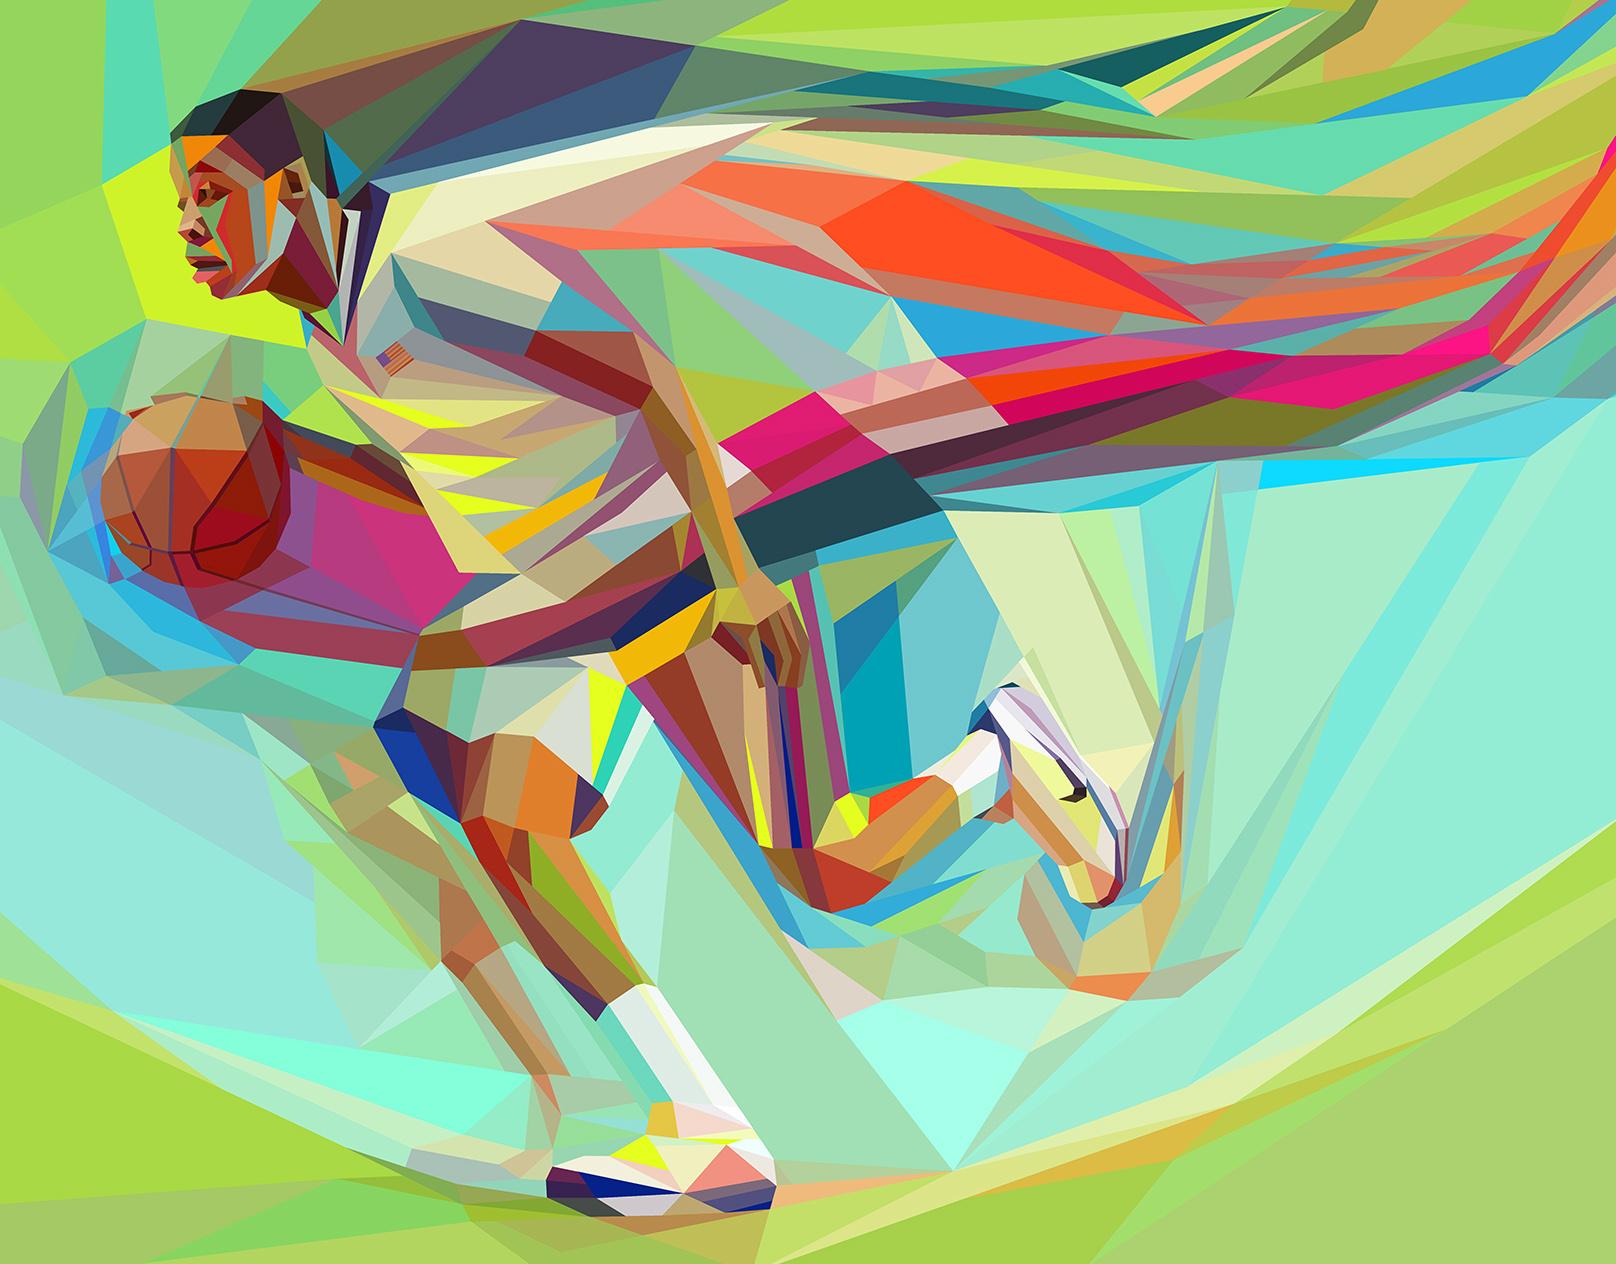 Turkey 2010 Basketball World Championship